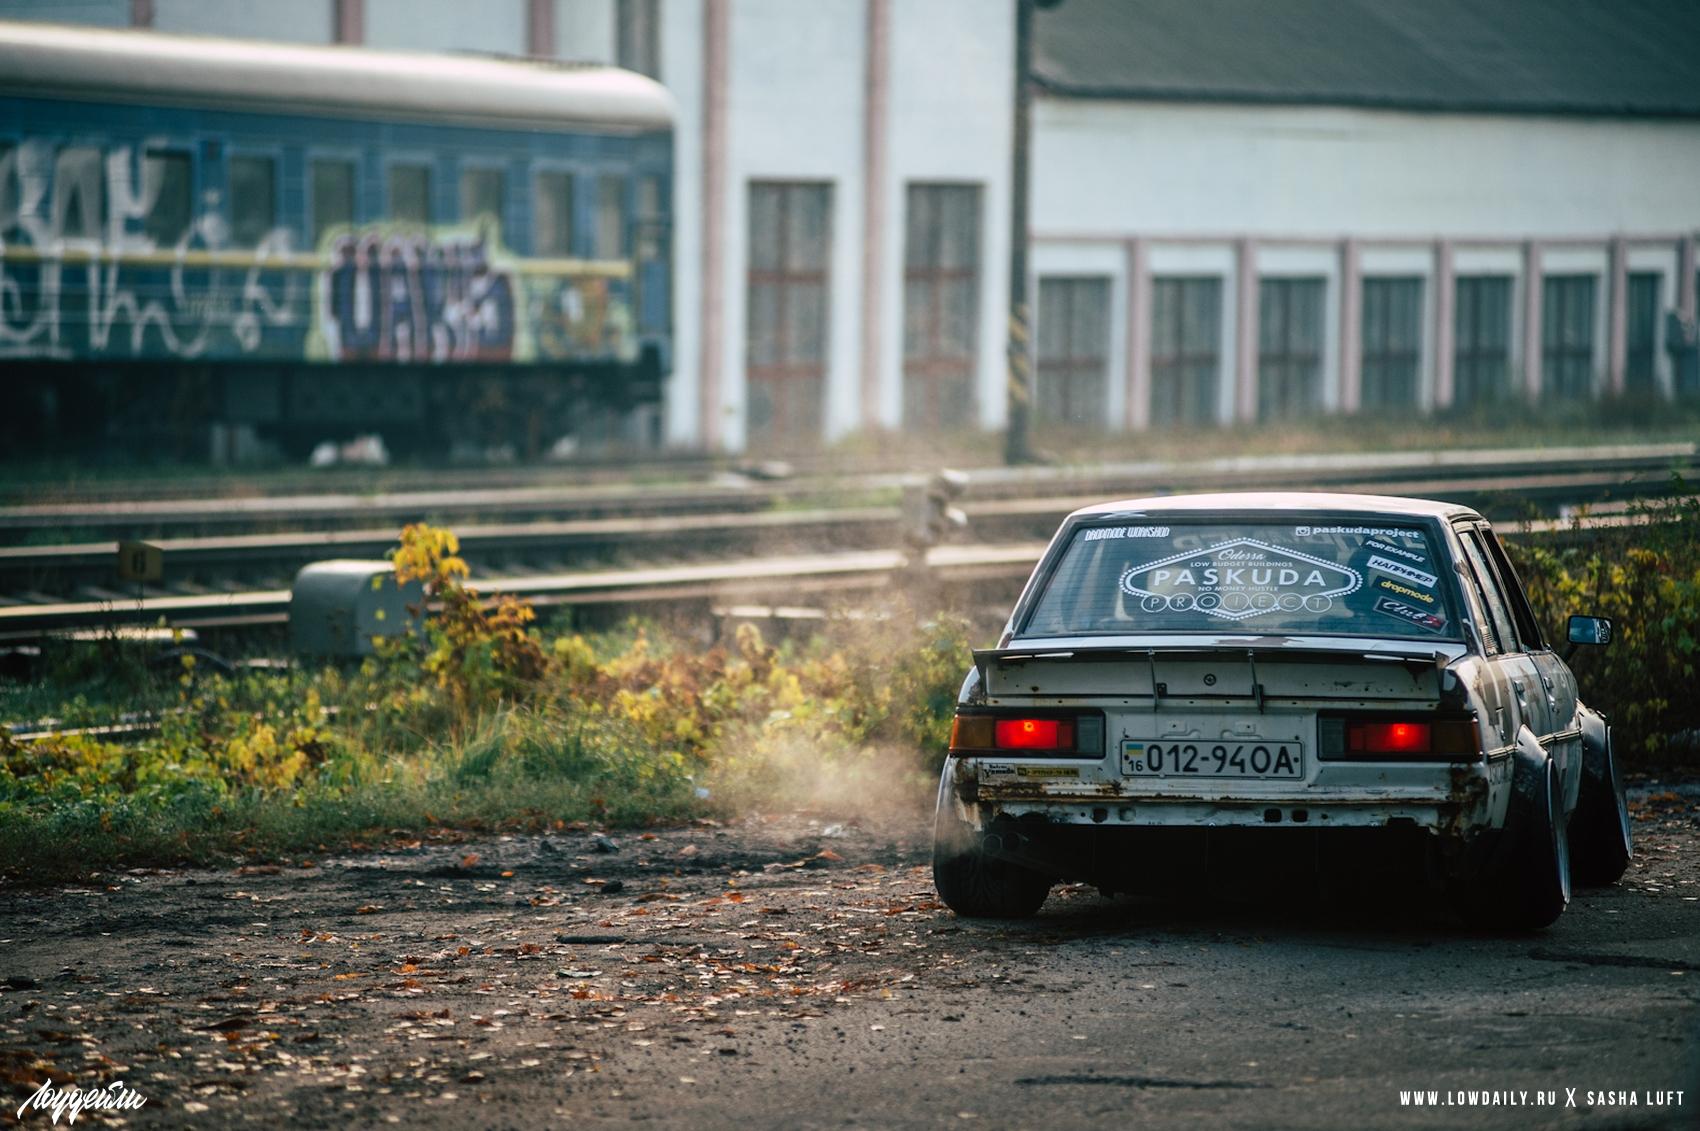 Toyota Corolla KE70 '82 LUF_2171